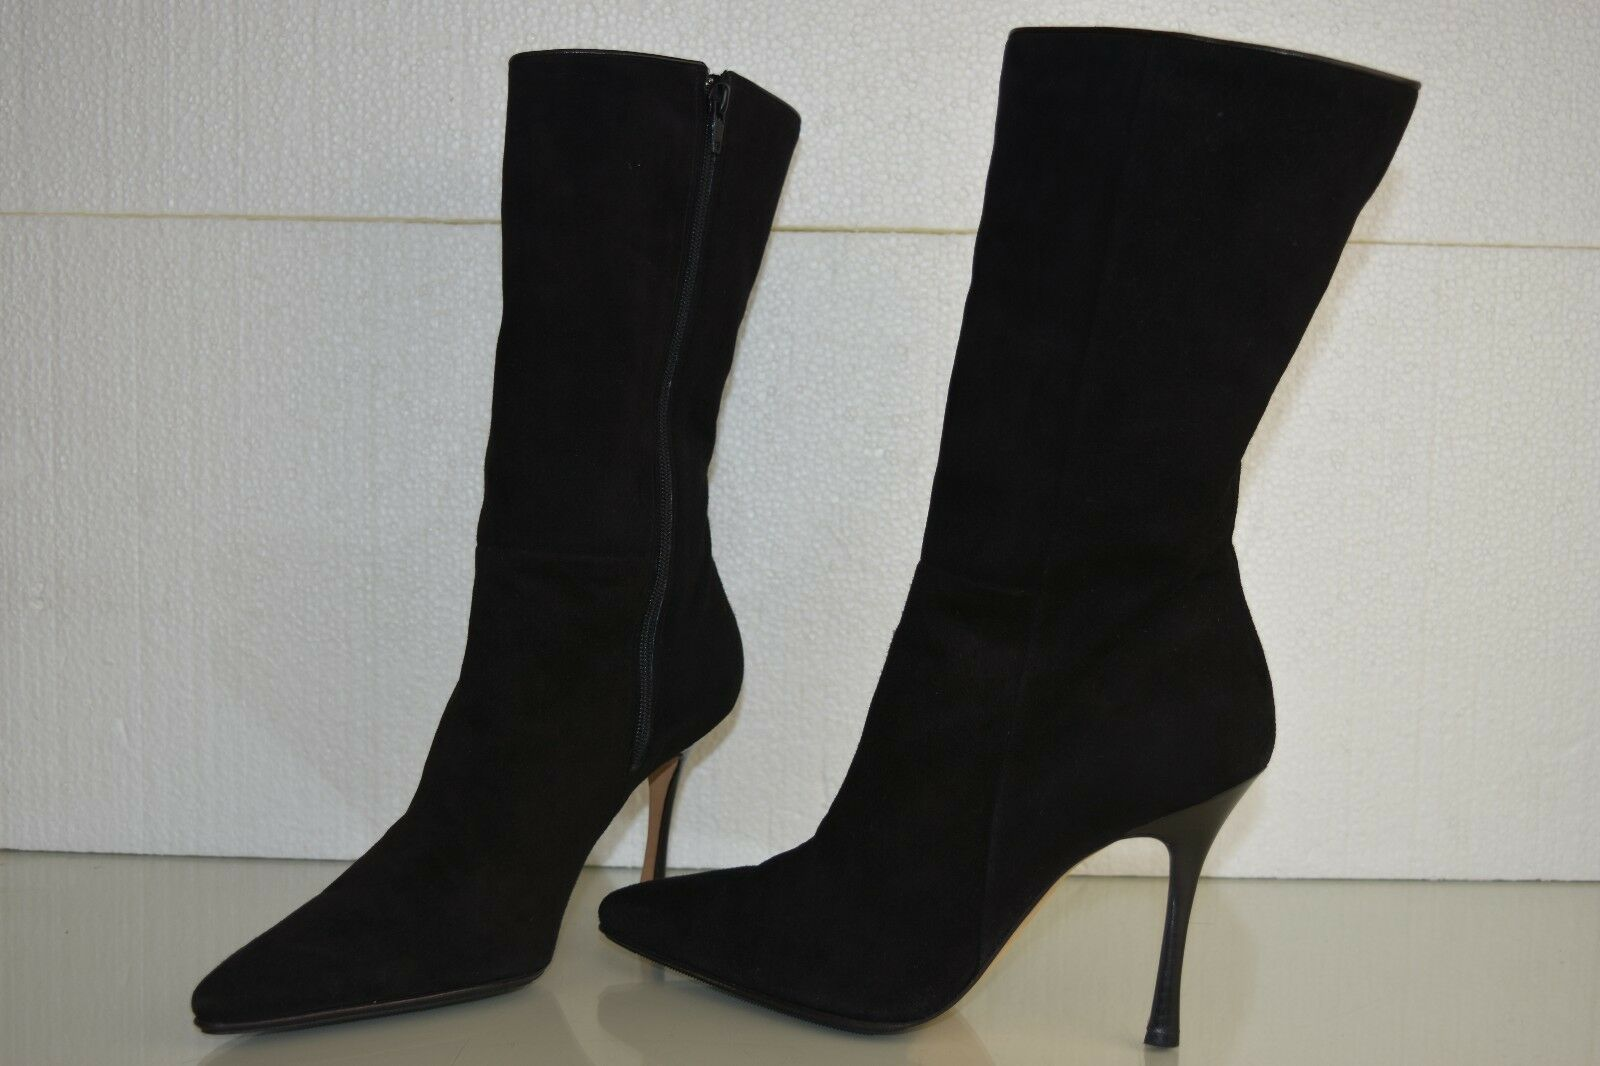 NEW Manolo Blahnik Black Suede Shearling FUR GATI Mid Boots shoes 39.5